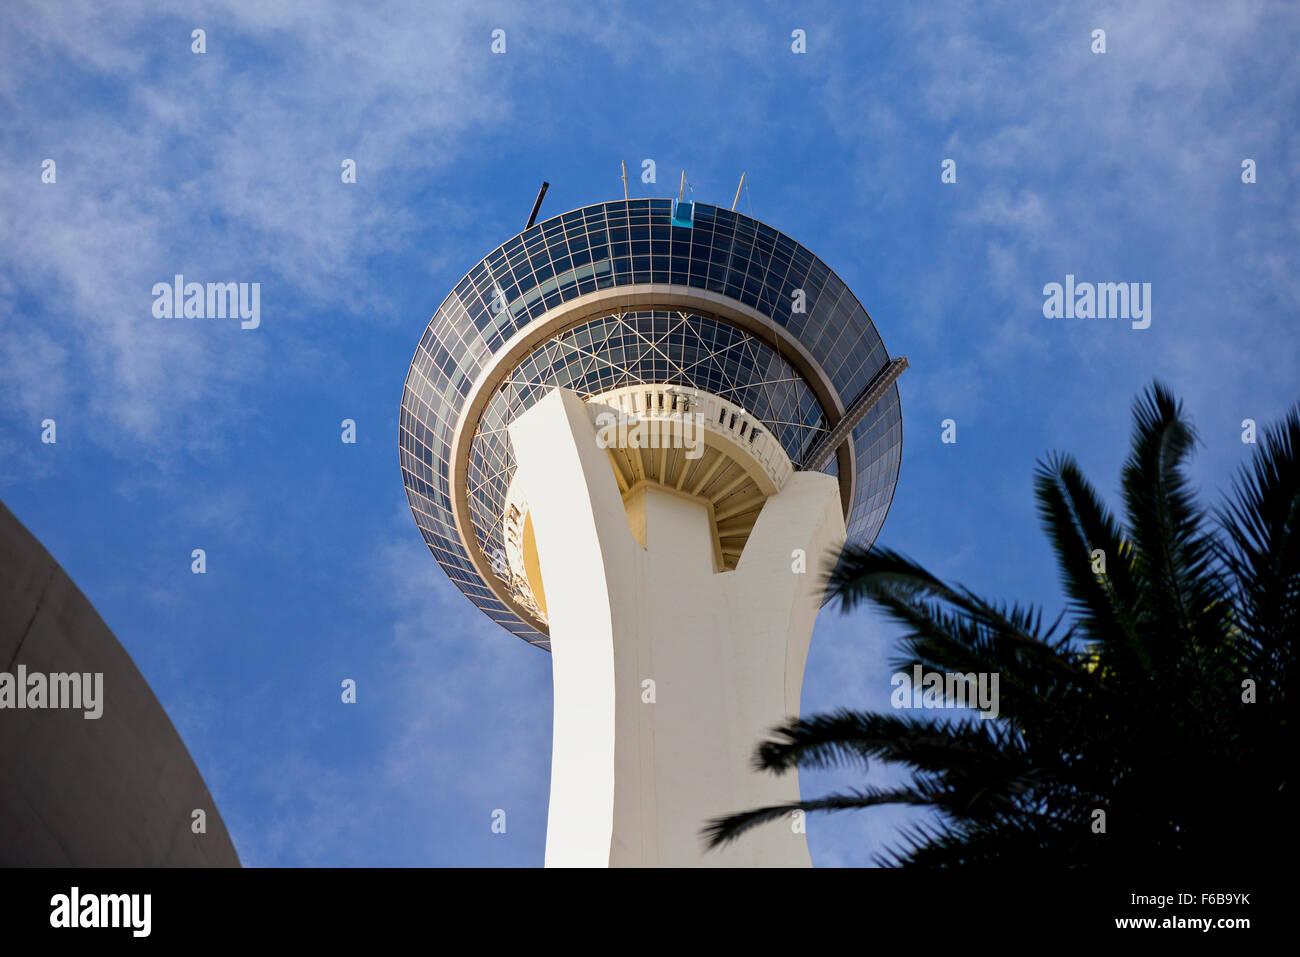 Stratosphere Hotel and Casino in Las Vegas Nevada - Stock Image